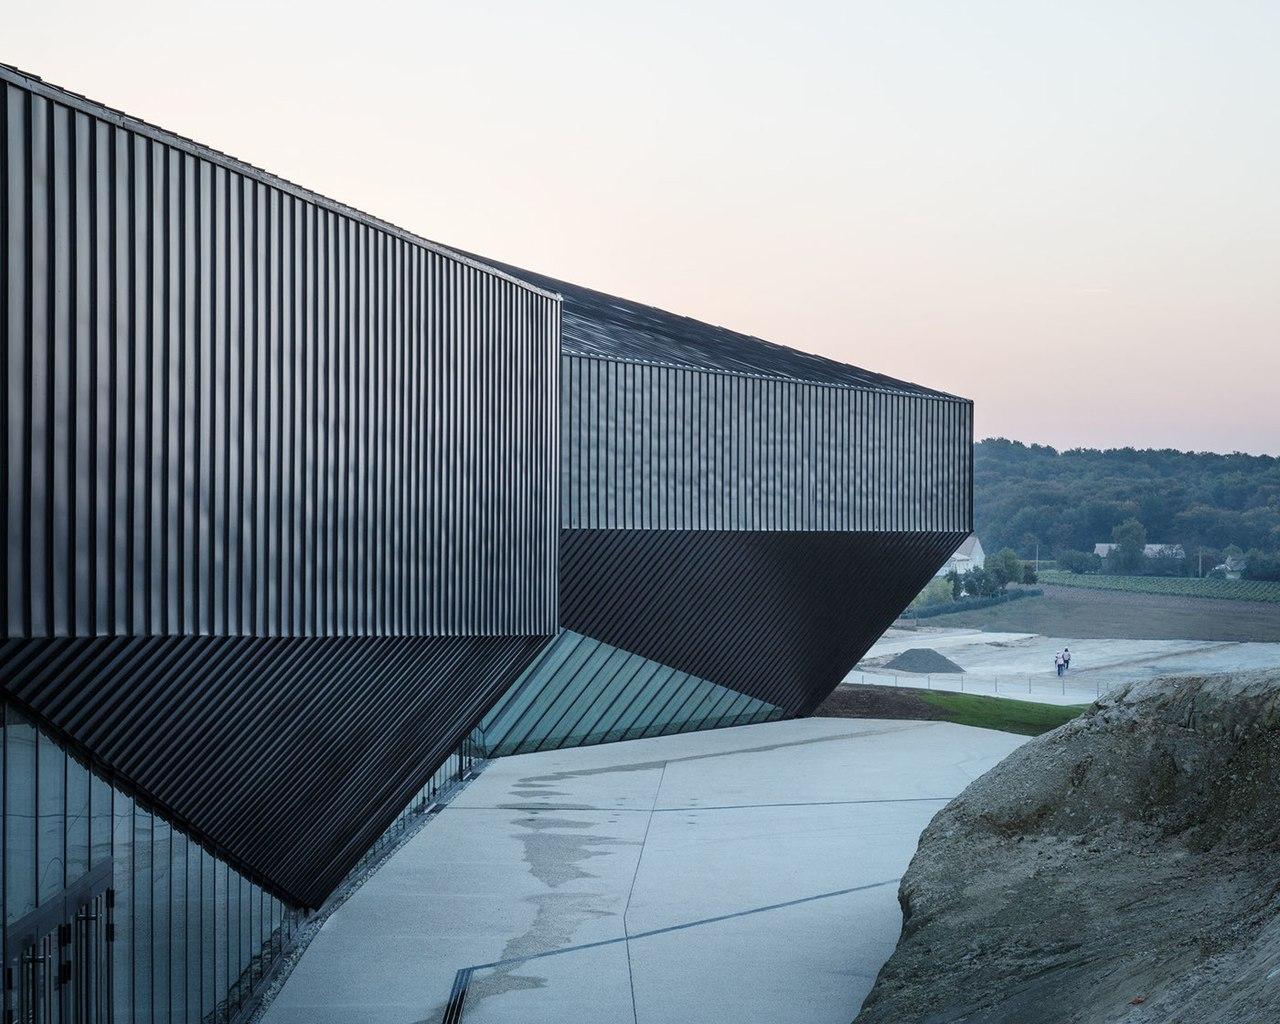 TETRARC architects